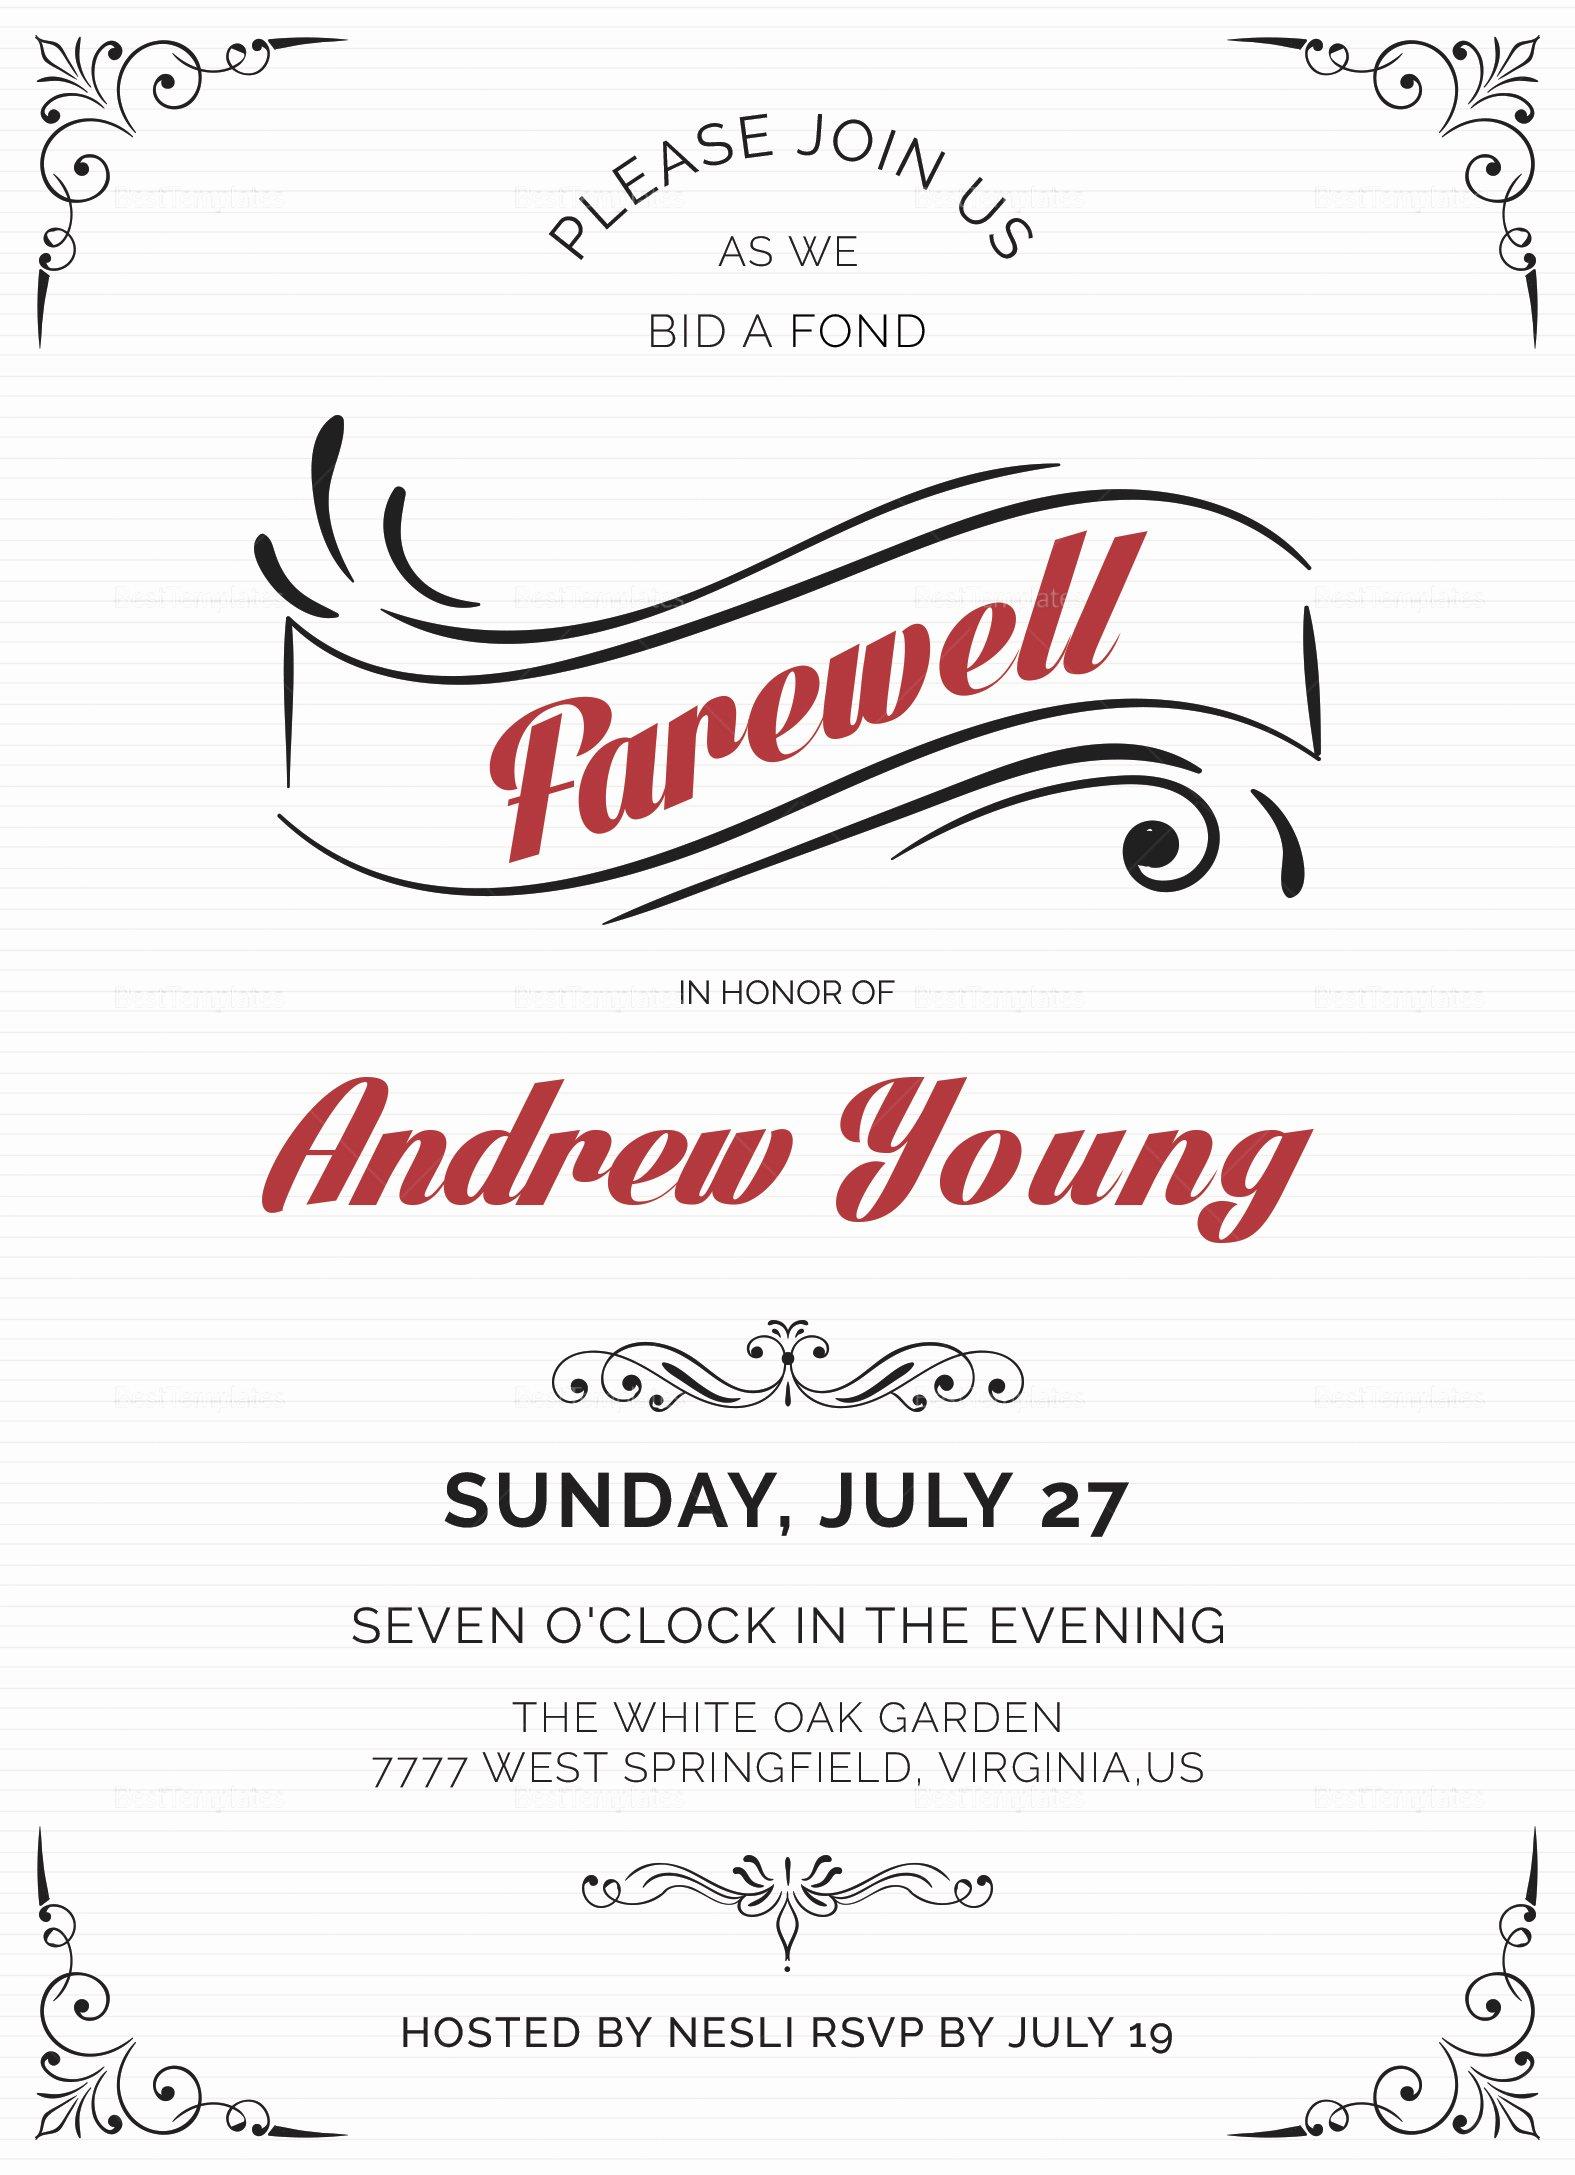 Farewell Party Invitation Wording Luxury Elegant Farewell Party Invitation Design Template In Word